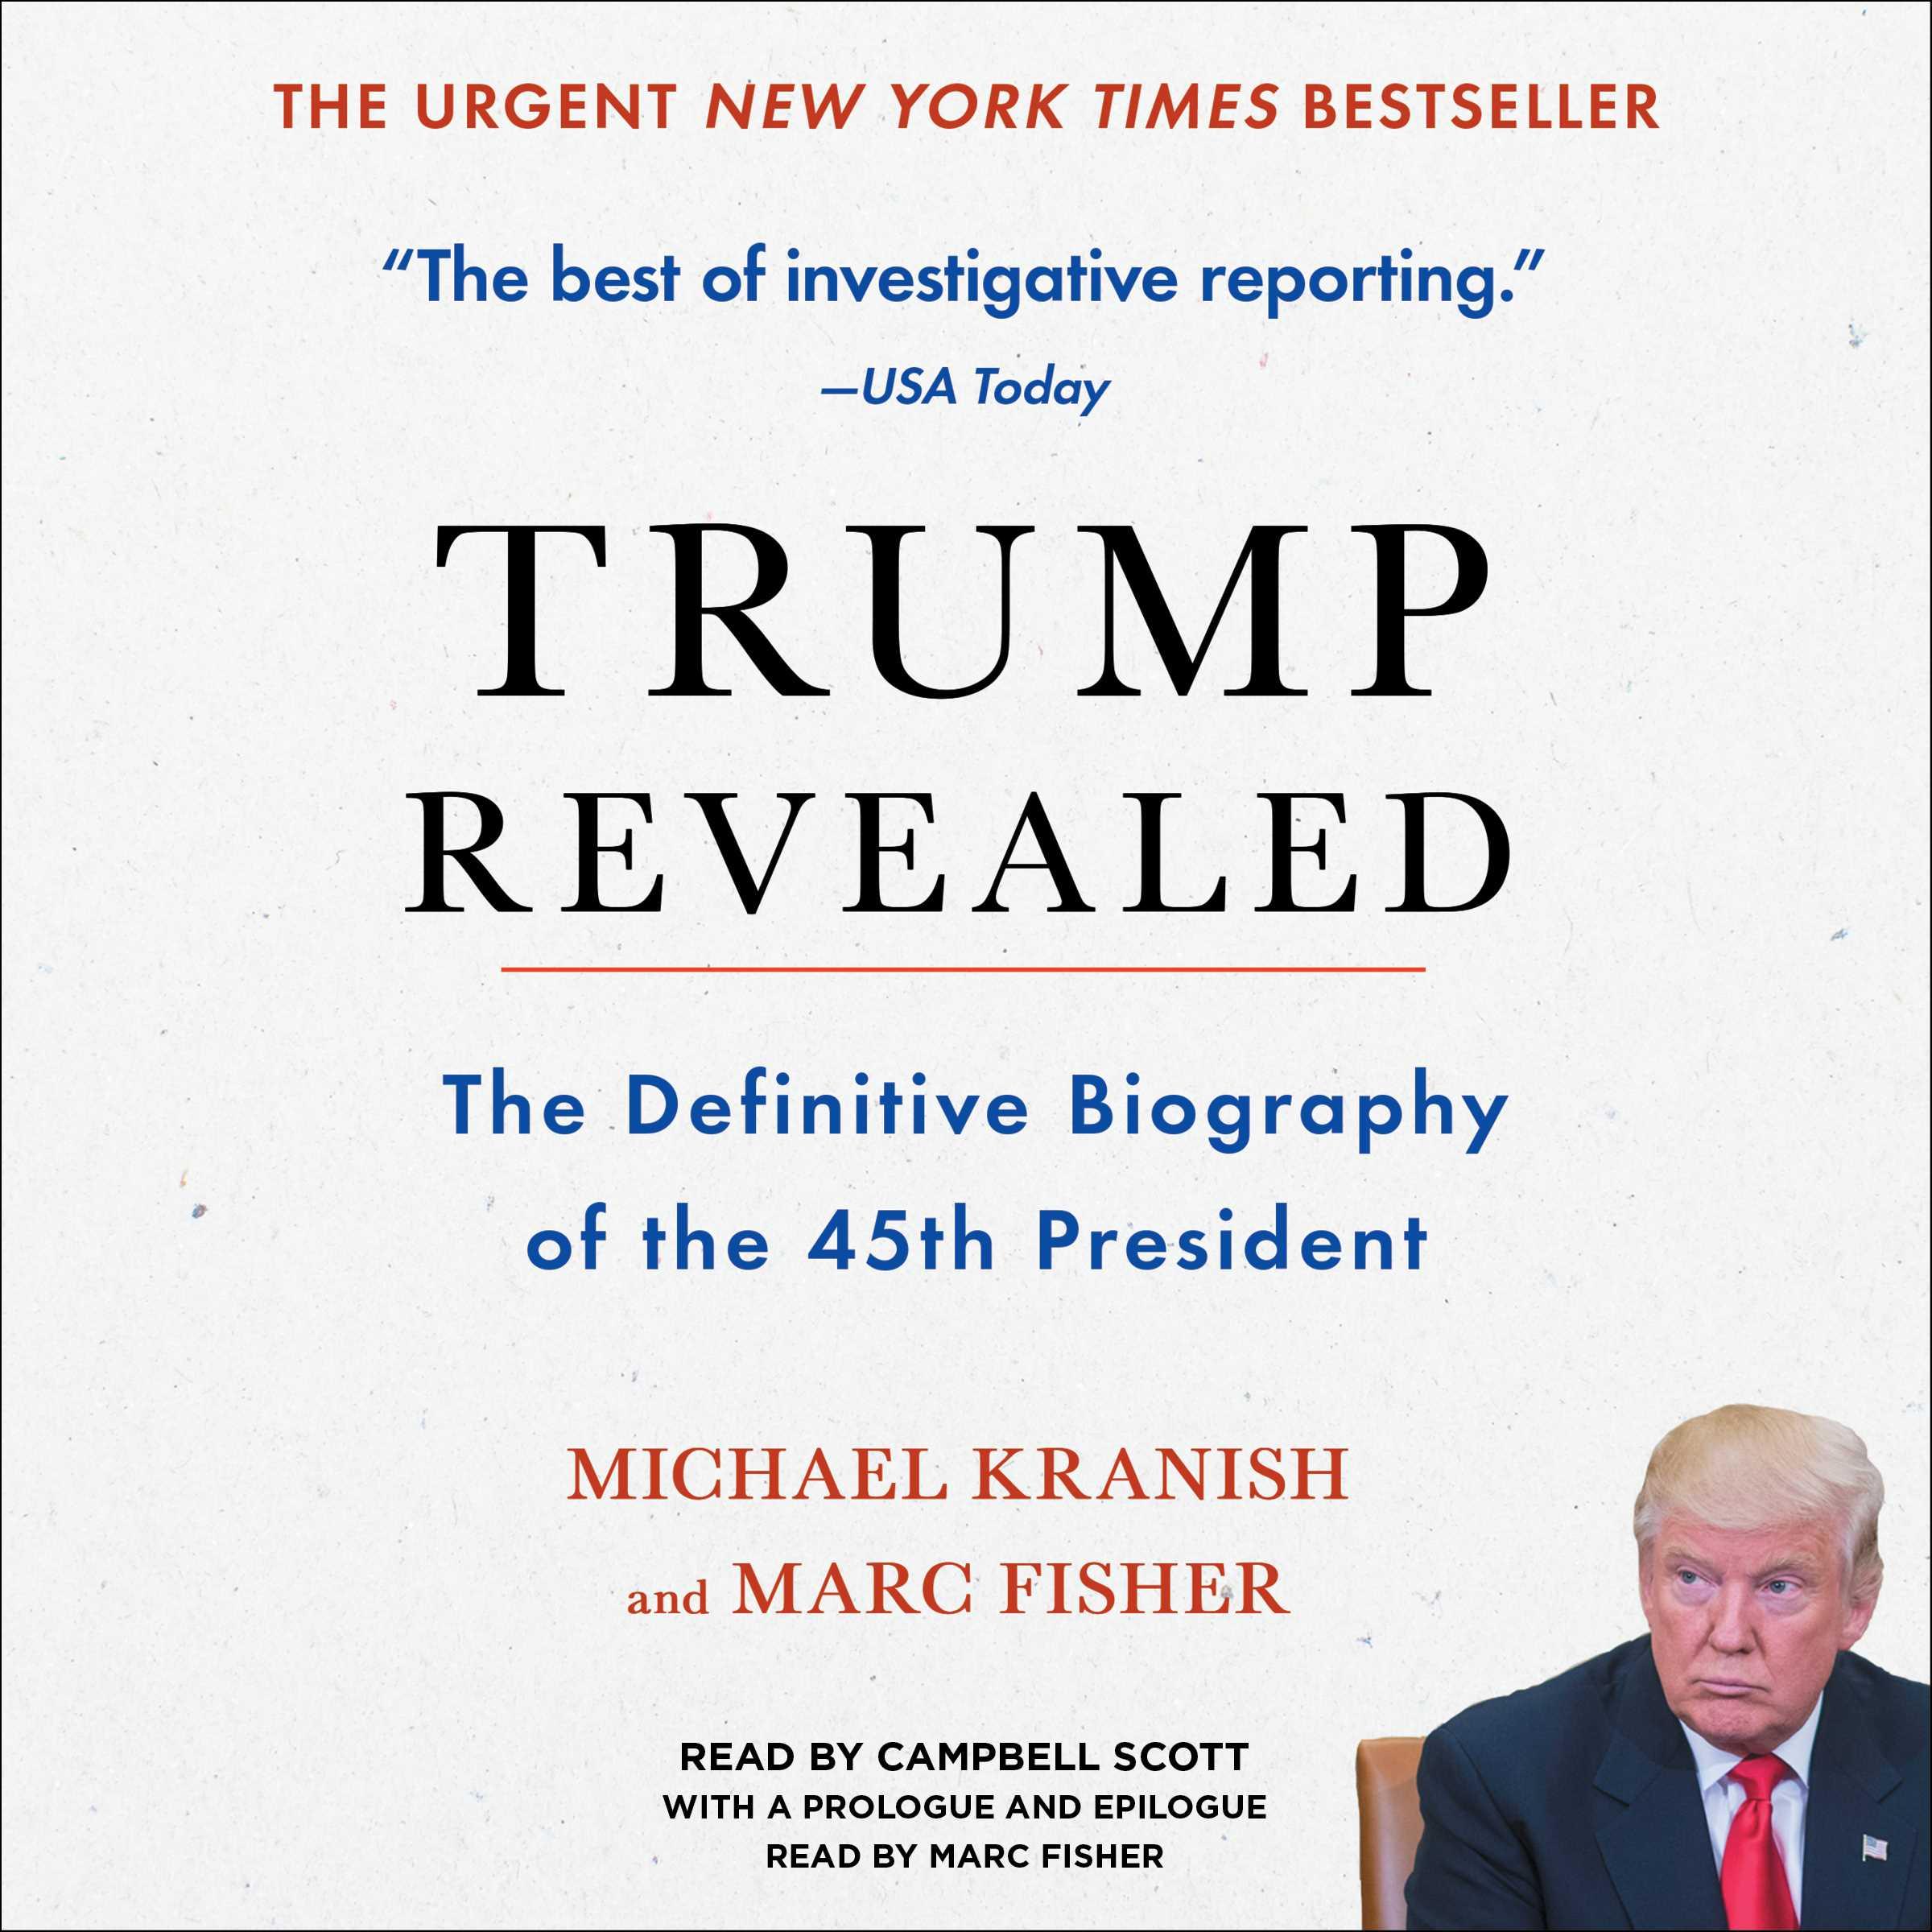 Trump revealed 9781508226765 hr